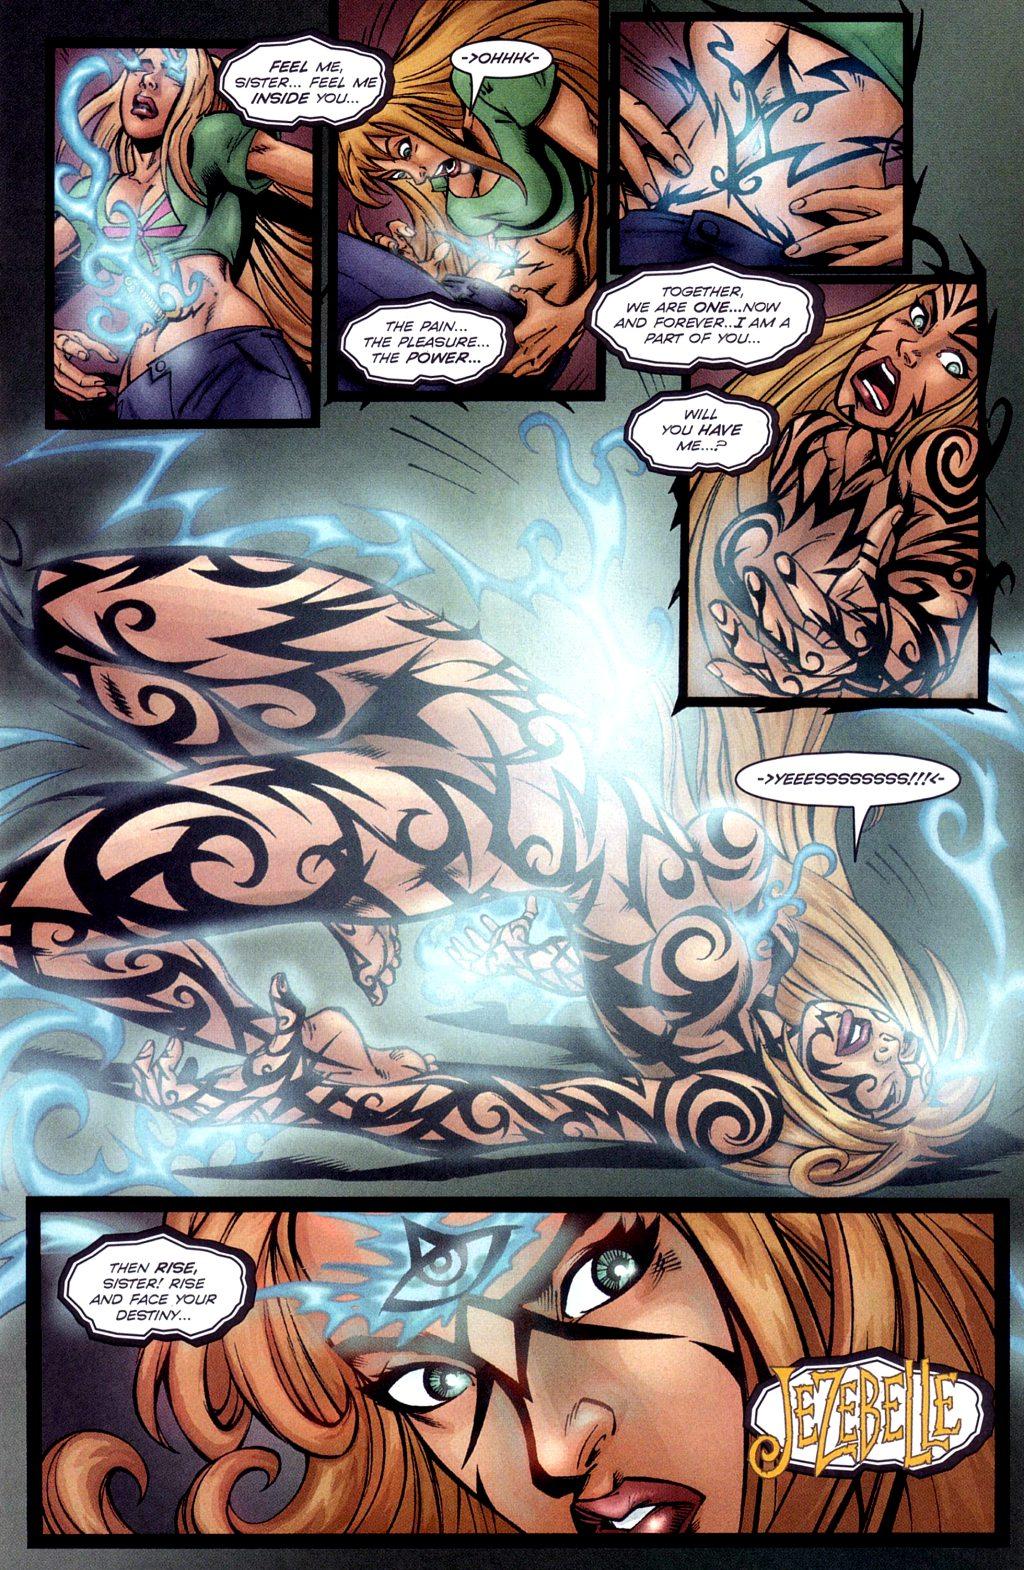 Read online Jezebelle comic -  Issue #3 - 11